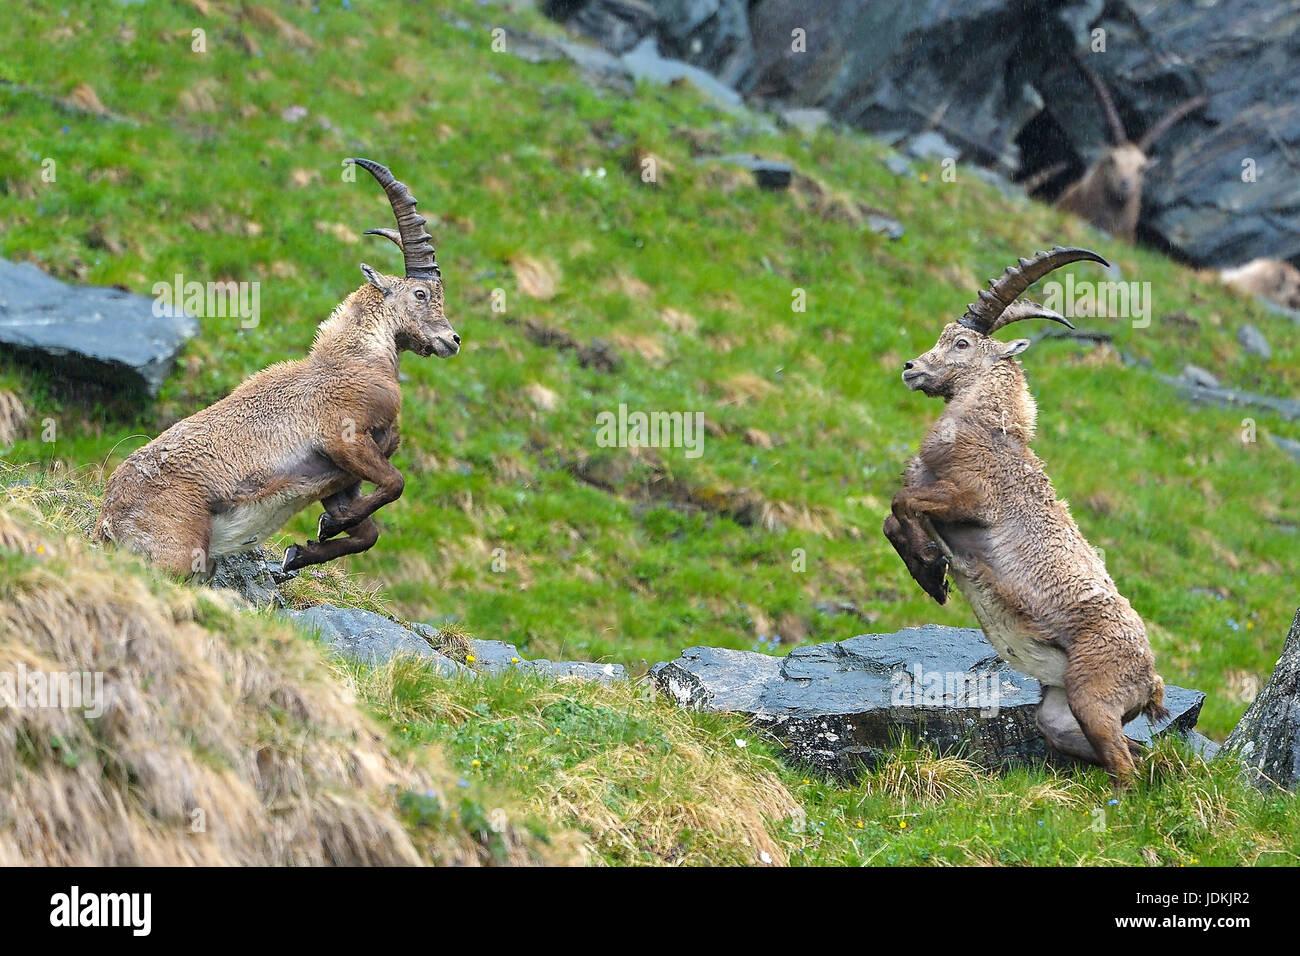 Steinbock, Capra ibex, ibex - Stock Image